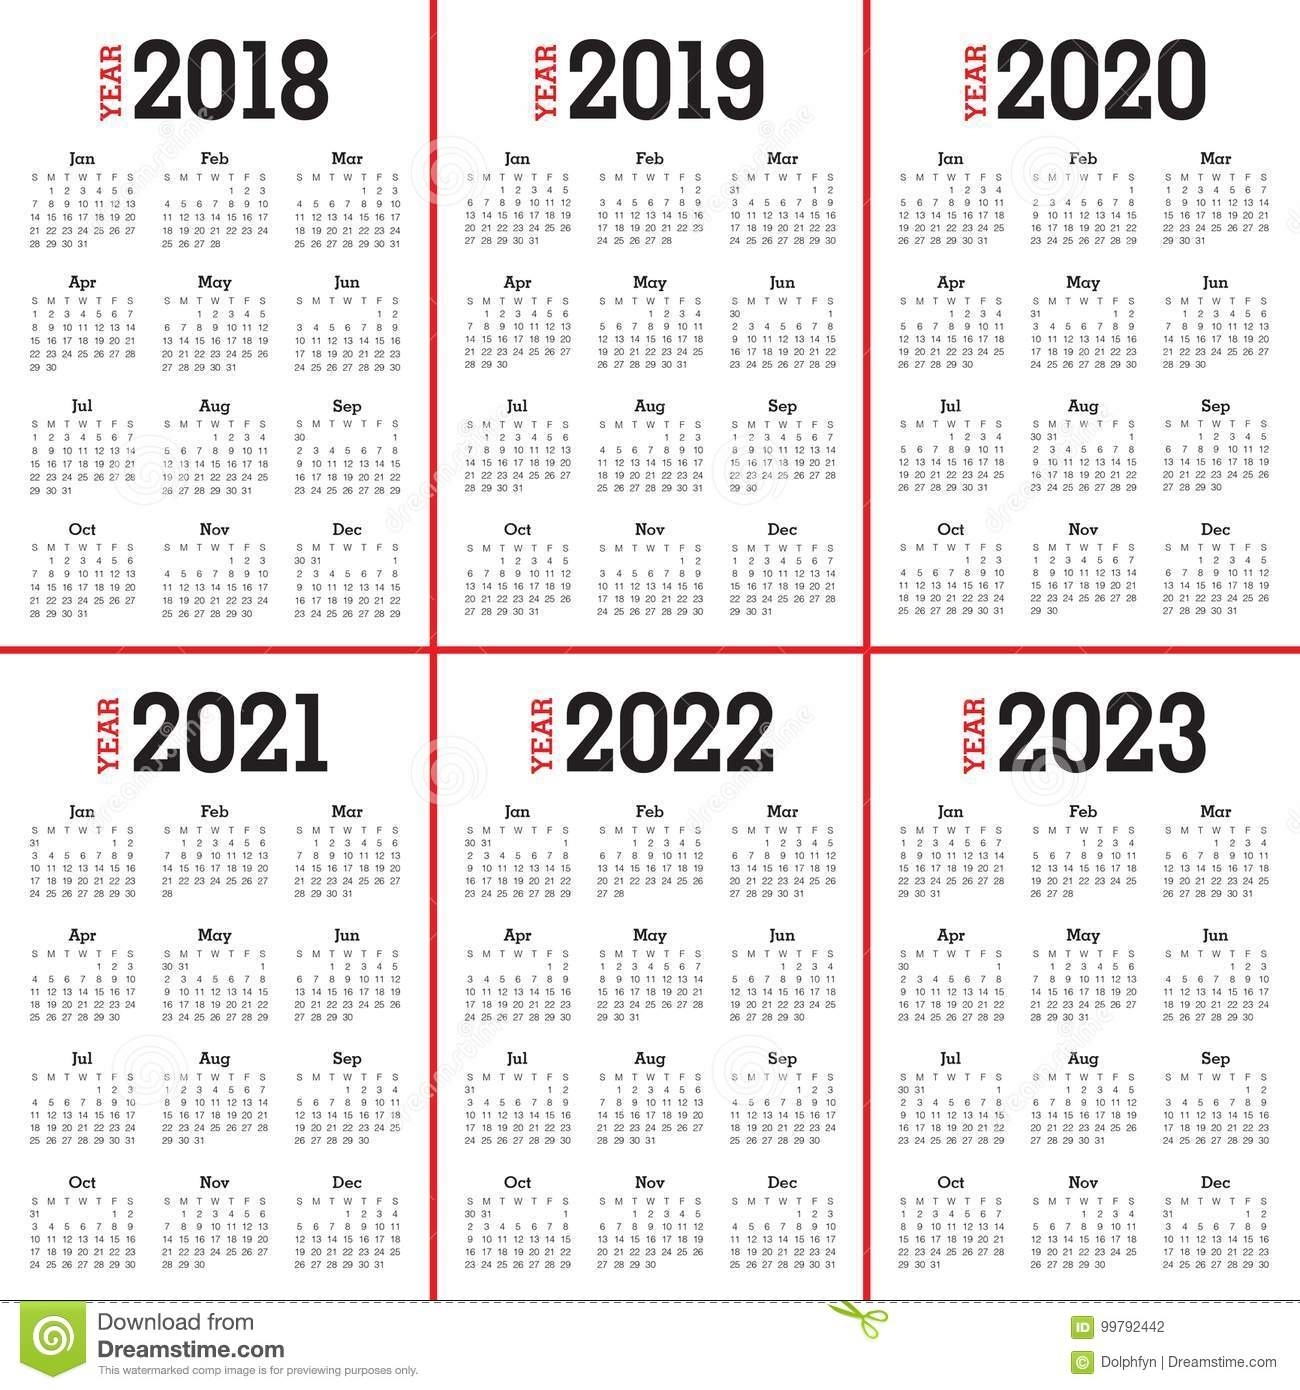 Year 2018 2019 2020 2021 2022 2023 Calendar Vector Stock for Calendar Years 2019 2020 2021 2022 2023